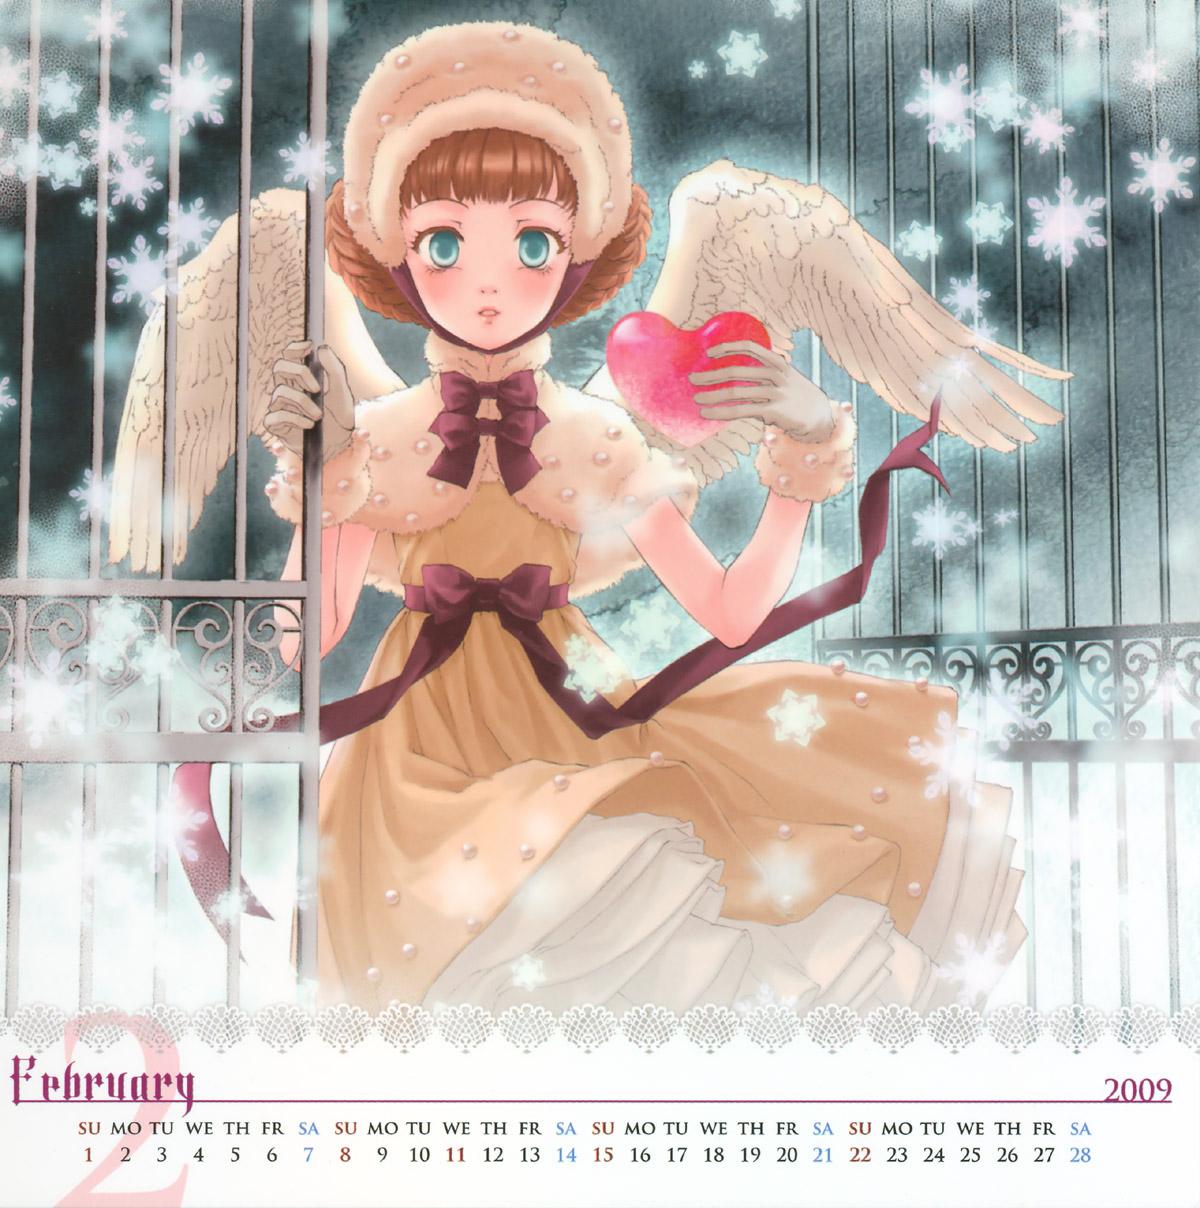 Lolita Style Calendar 2008 image by Closet Child